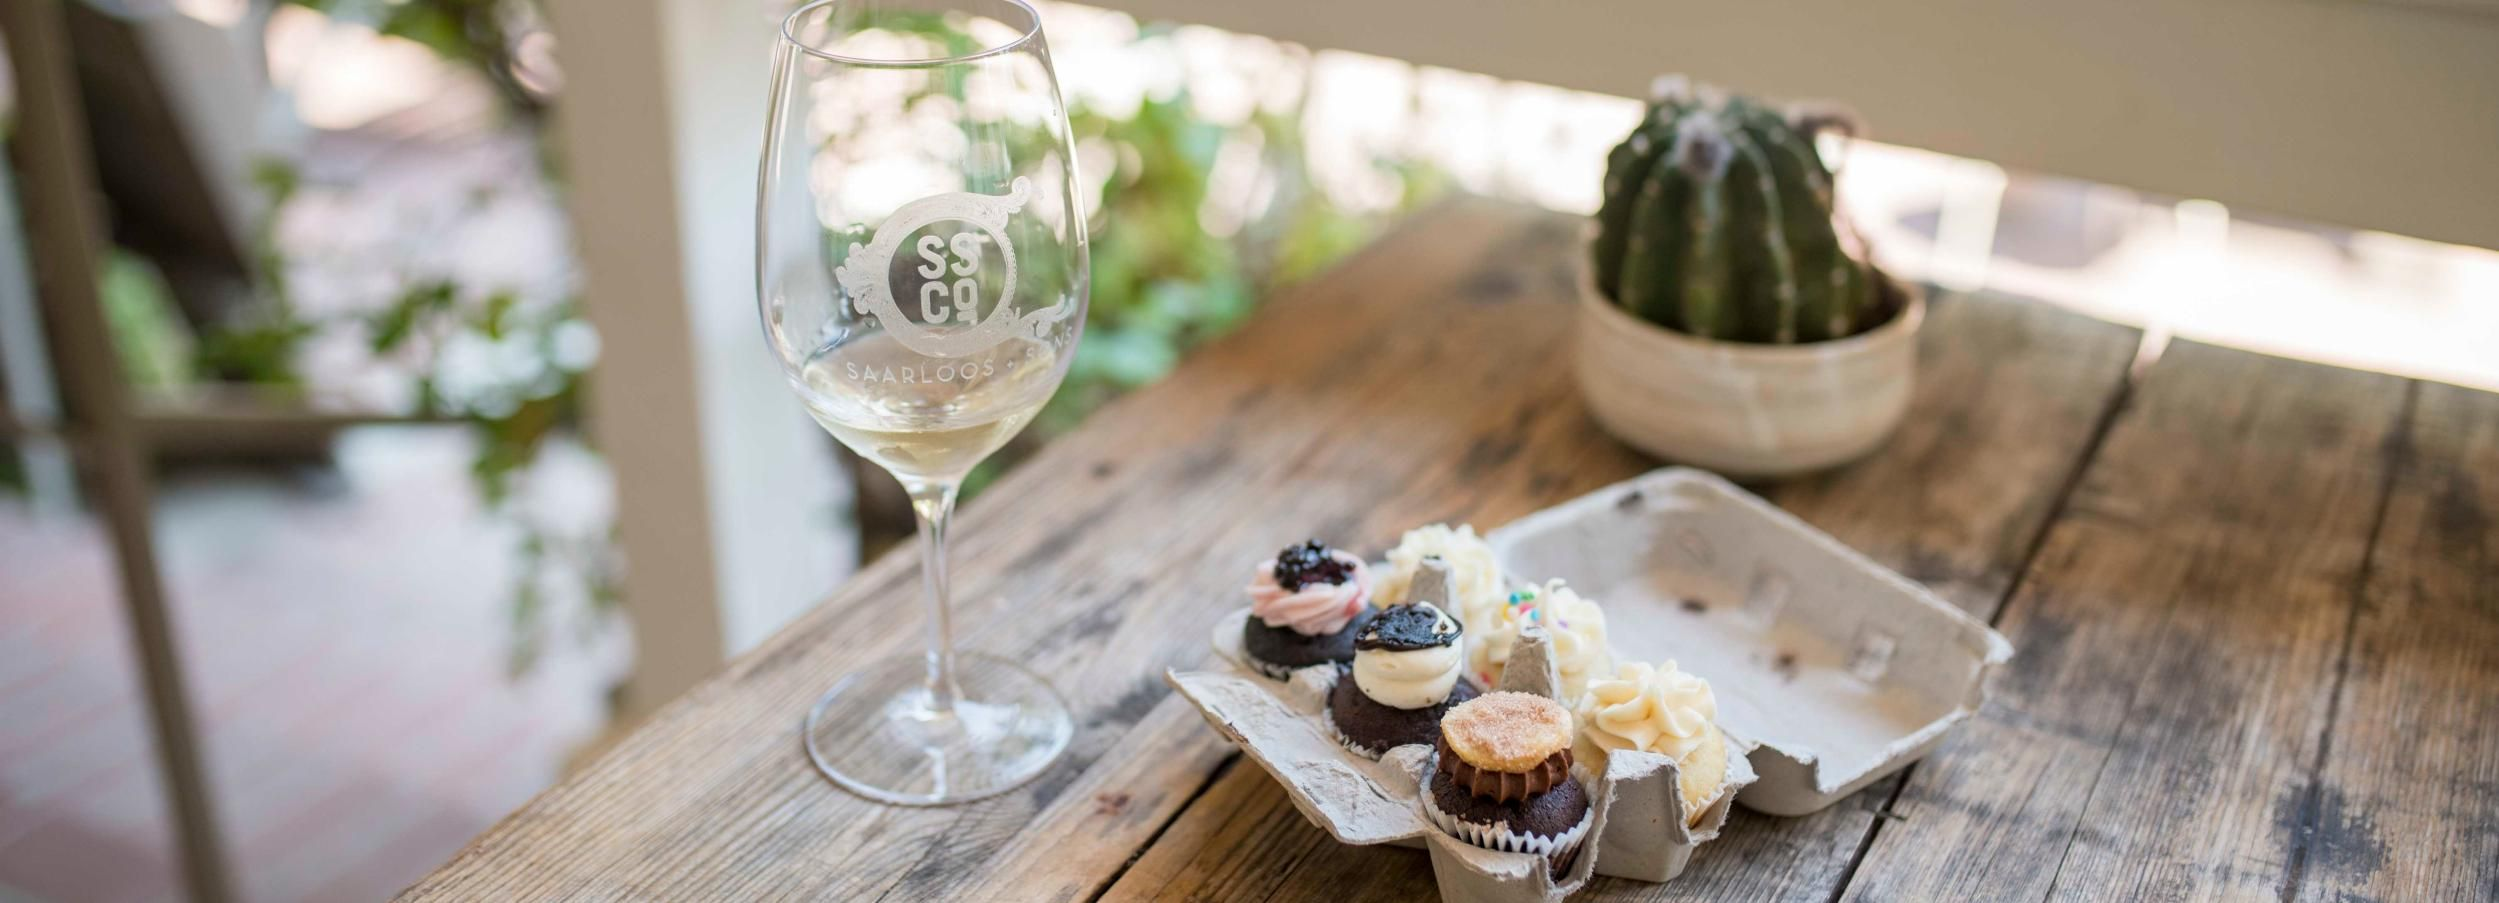 Santa Barbara: Cupcake and Wine Tour